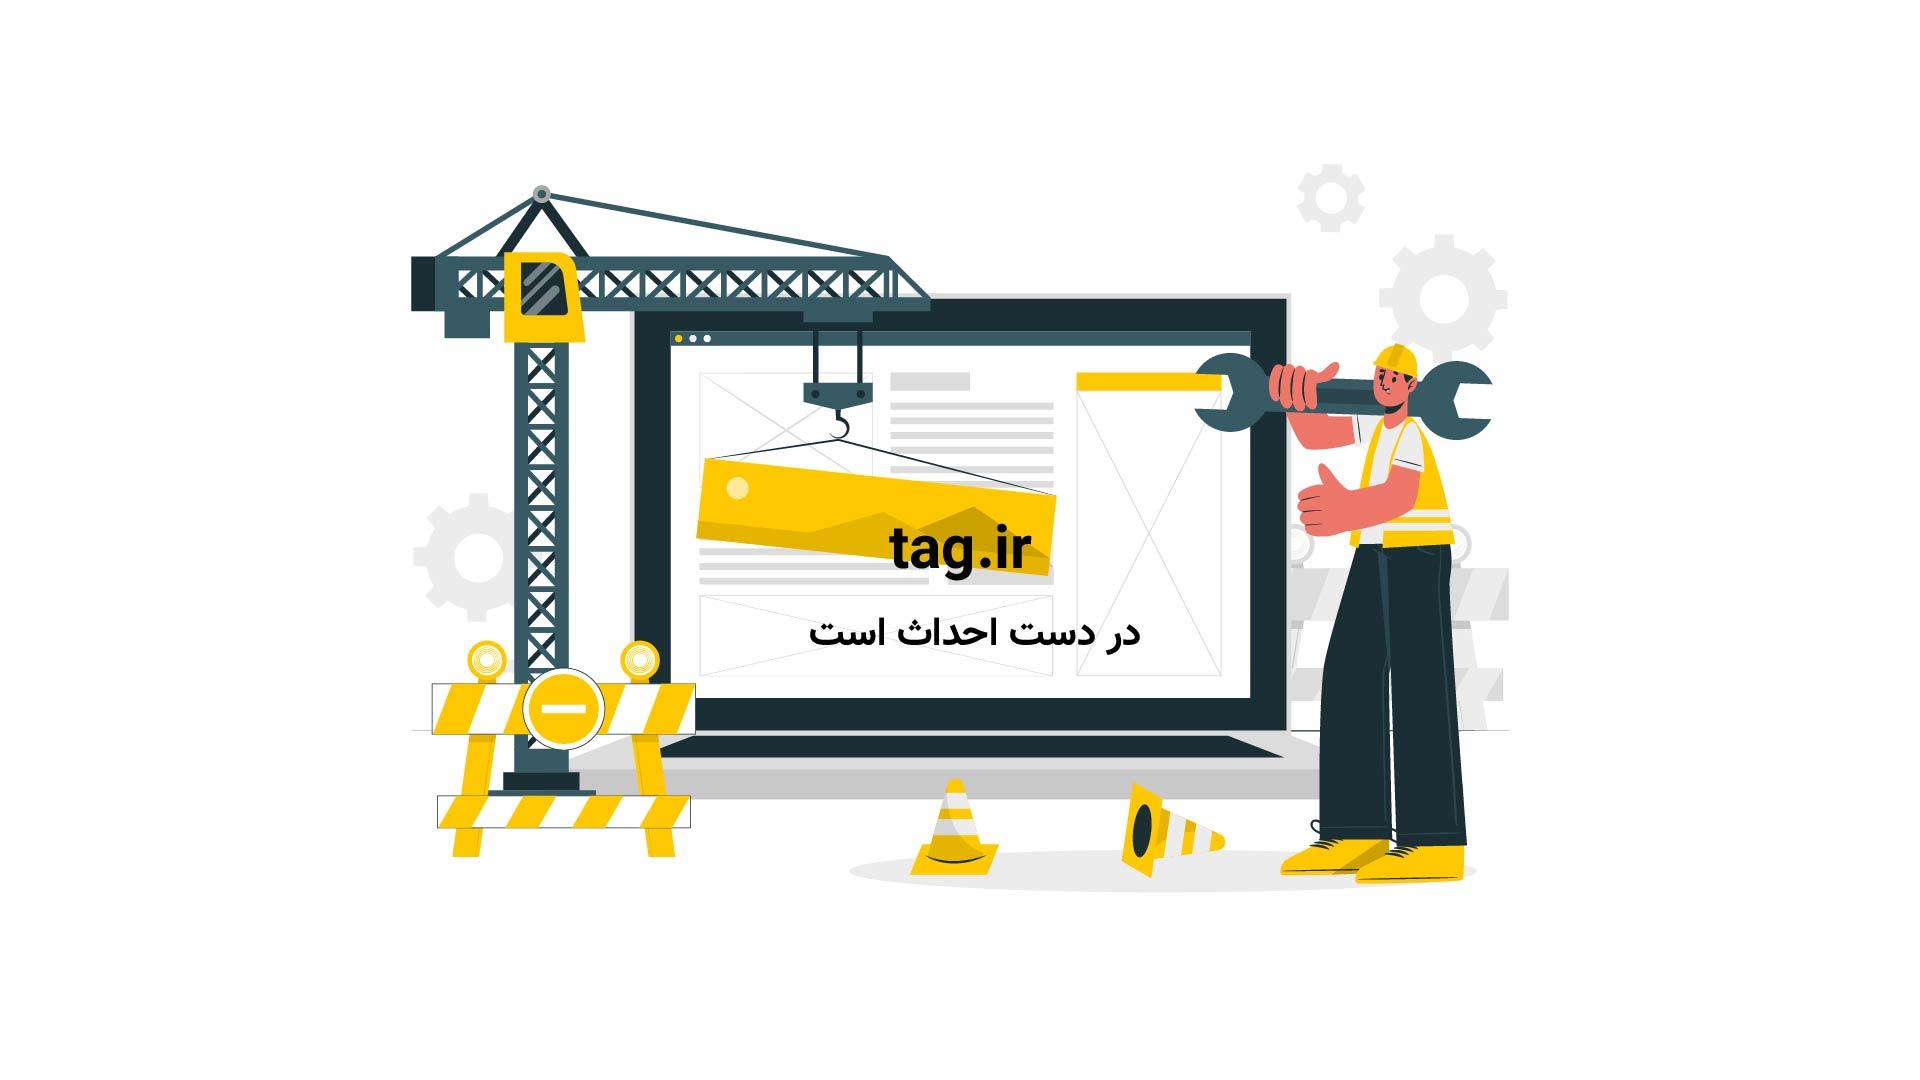 خفاش | تگ